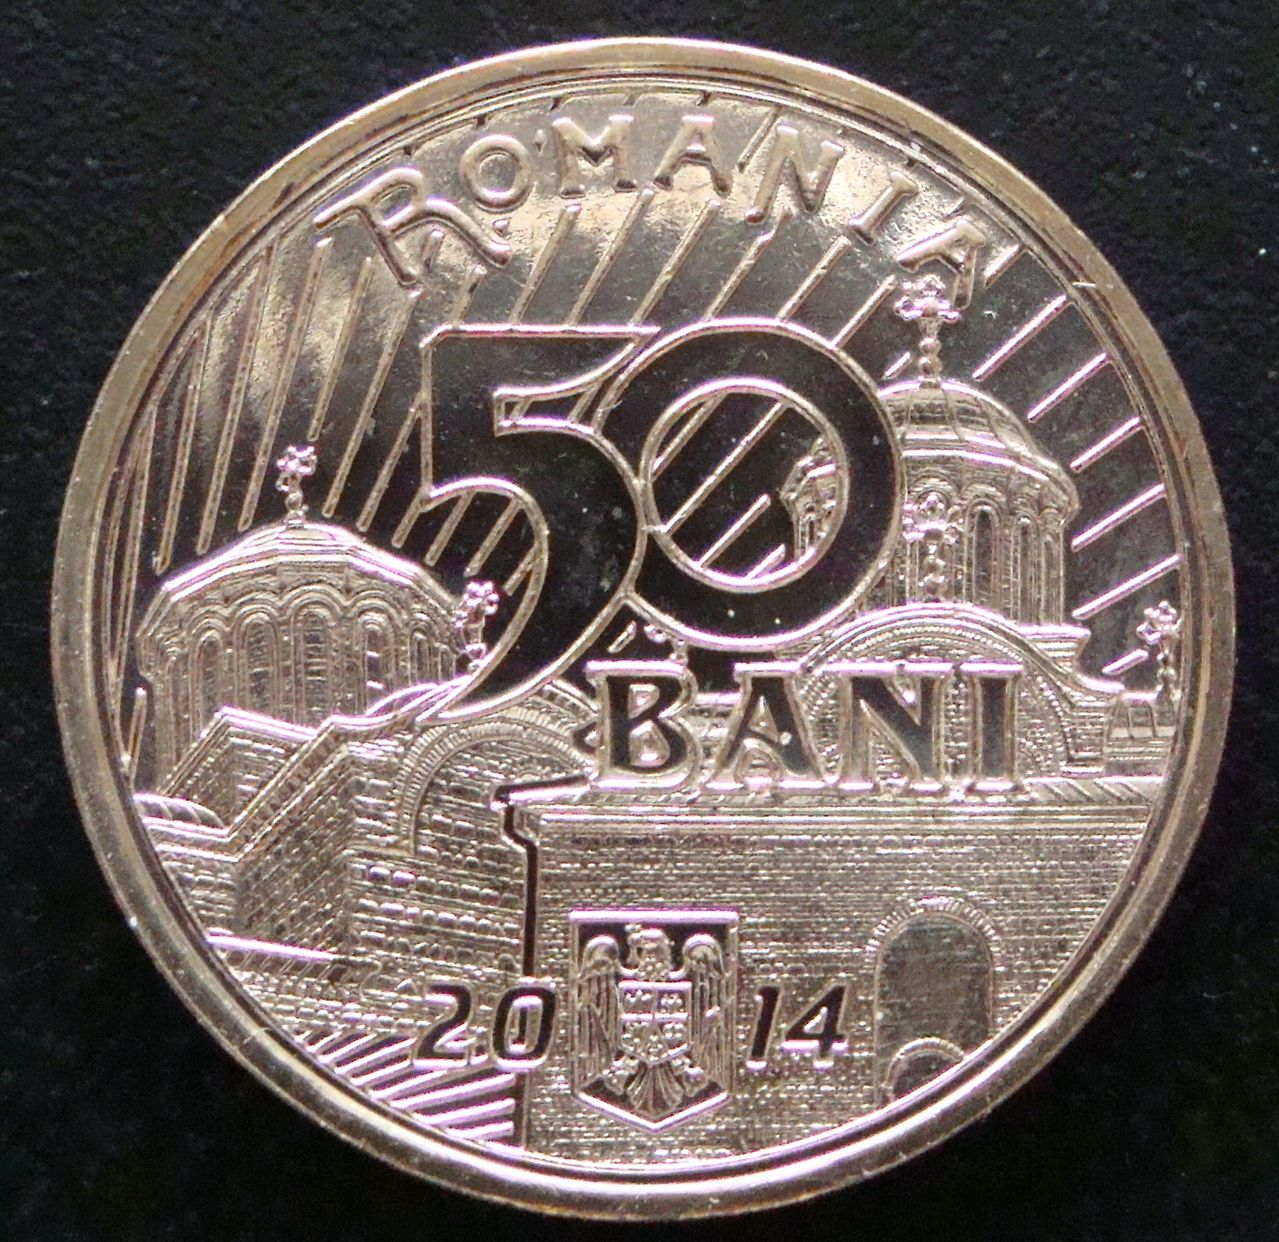 50 Bani. Rumania (2014) Vladislav  RUM_50_Bani_Vladislav_I_Vlaicu_anv